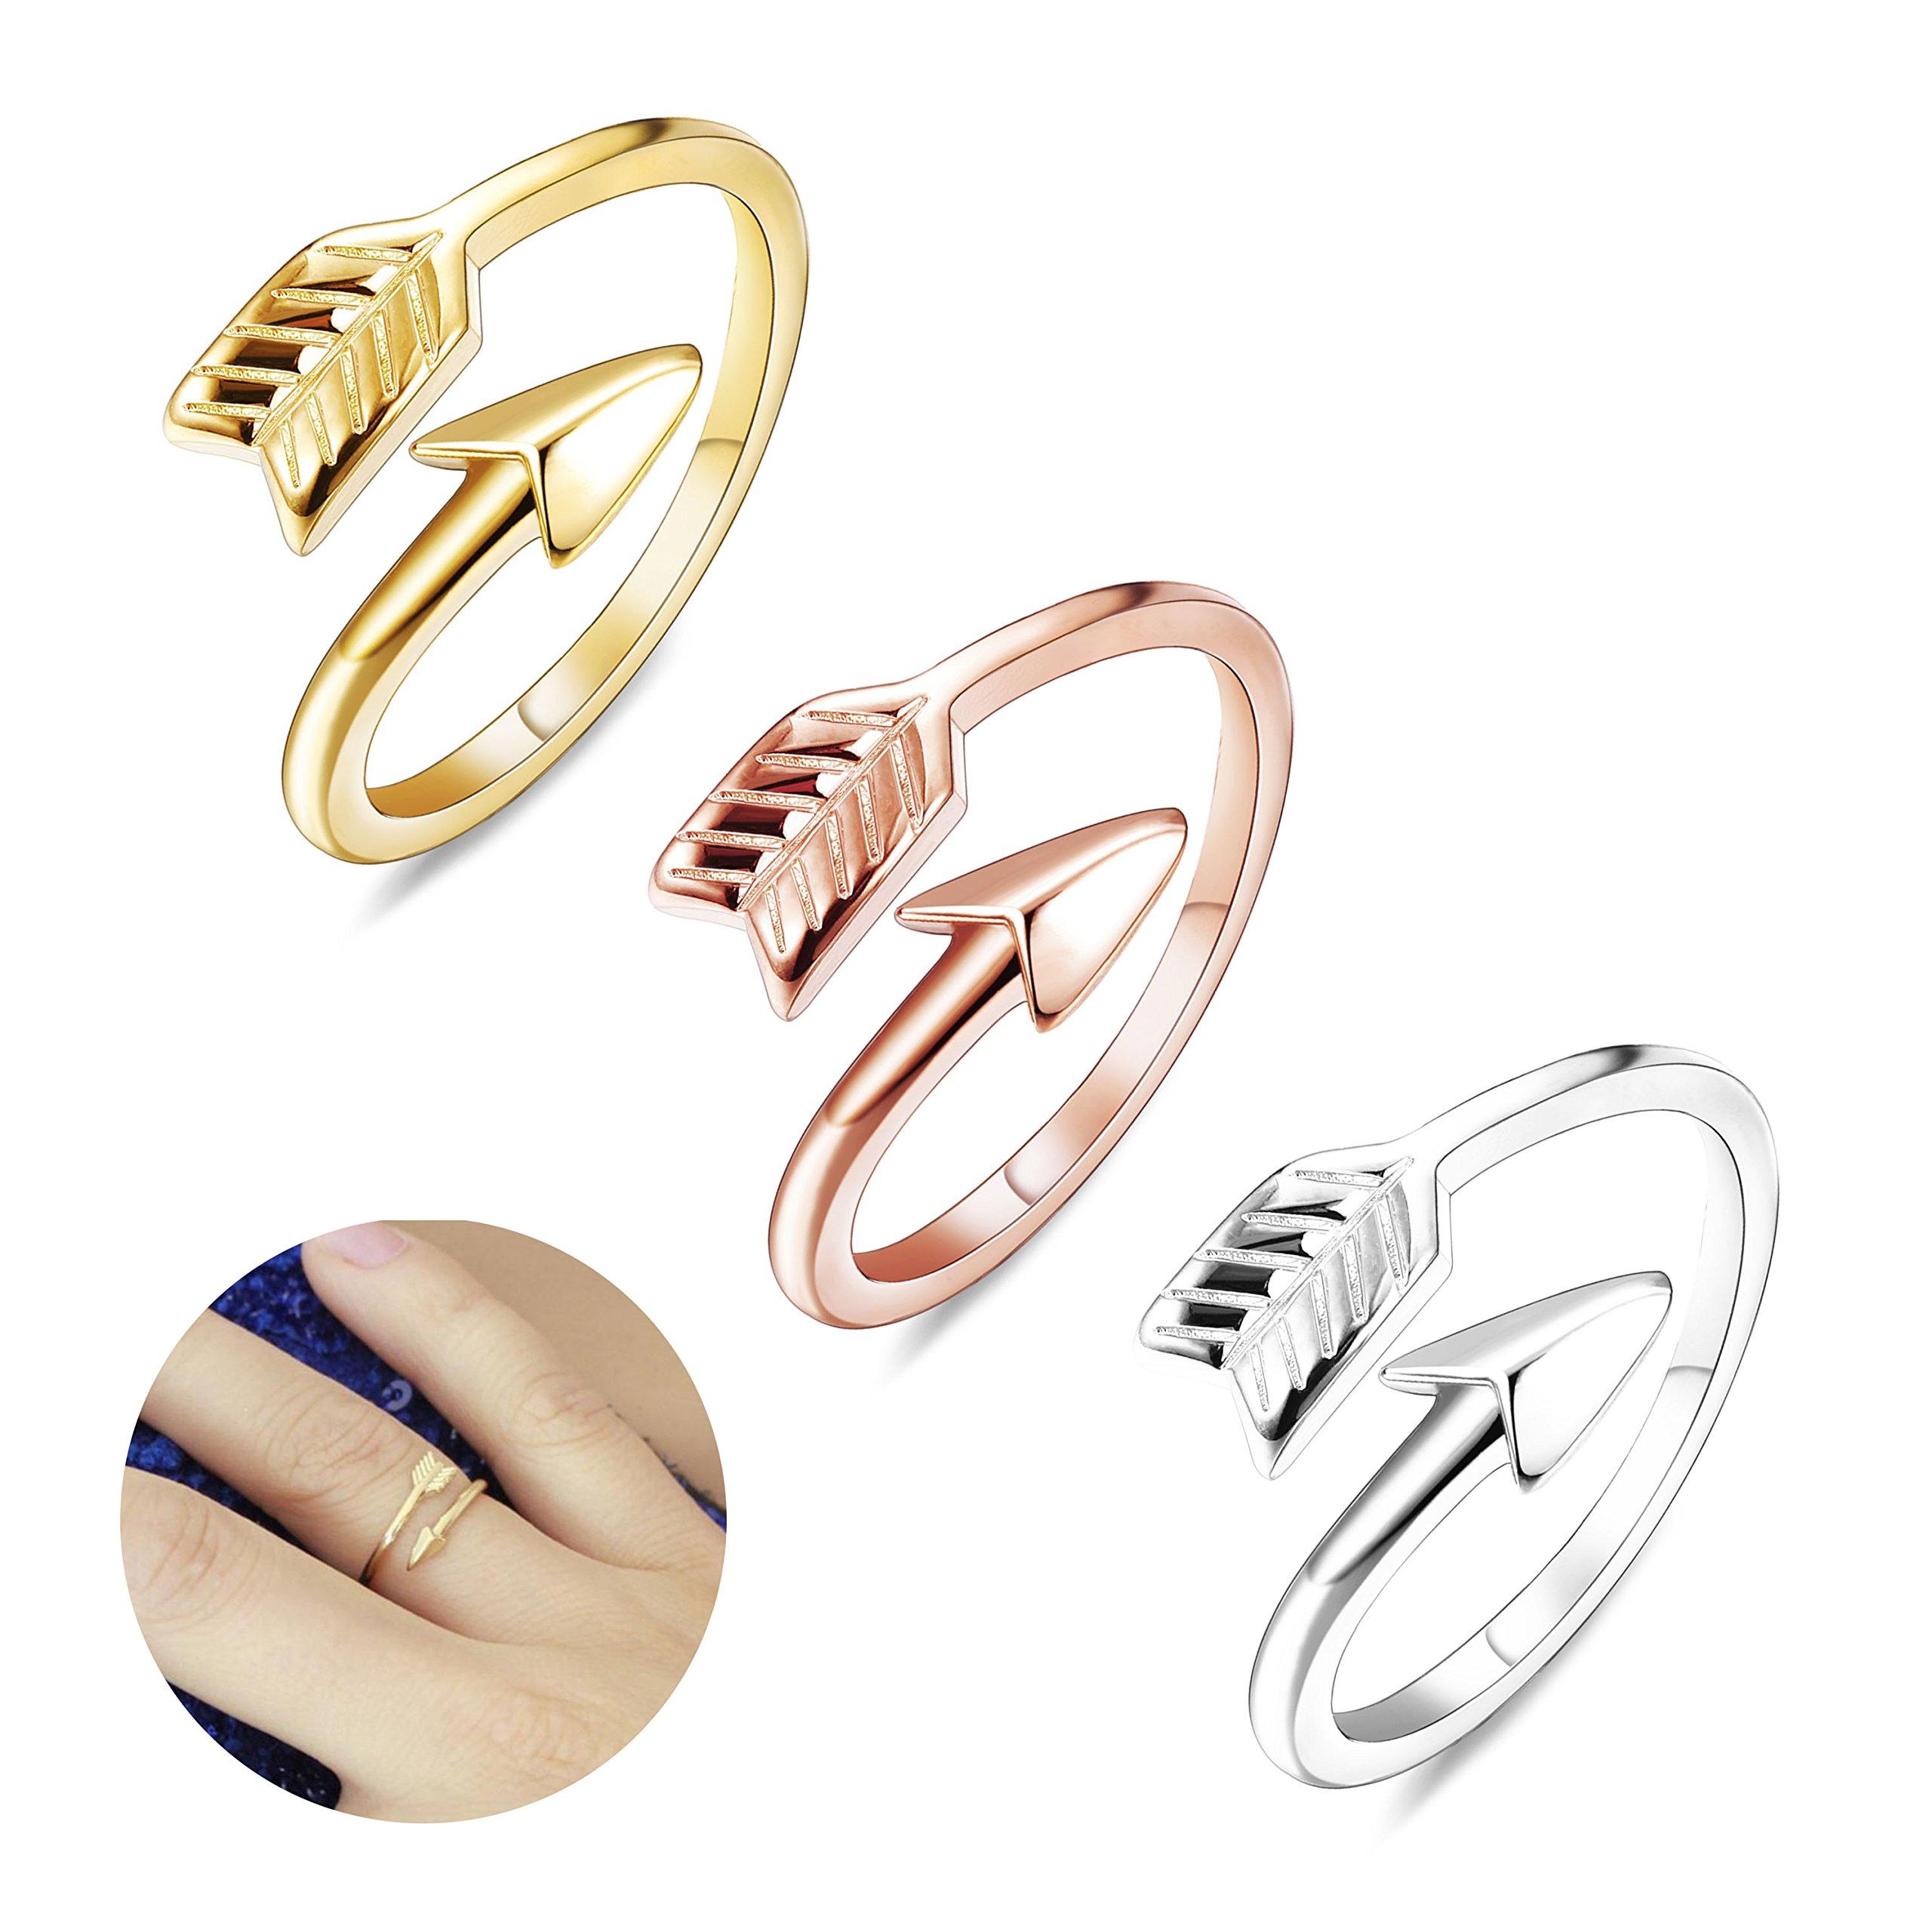 Finrezio 3 PCS Adjustable Open Arrow Rings for Women Stackable Knuckle Ring Wedding Gift